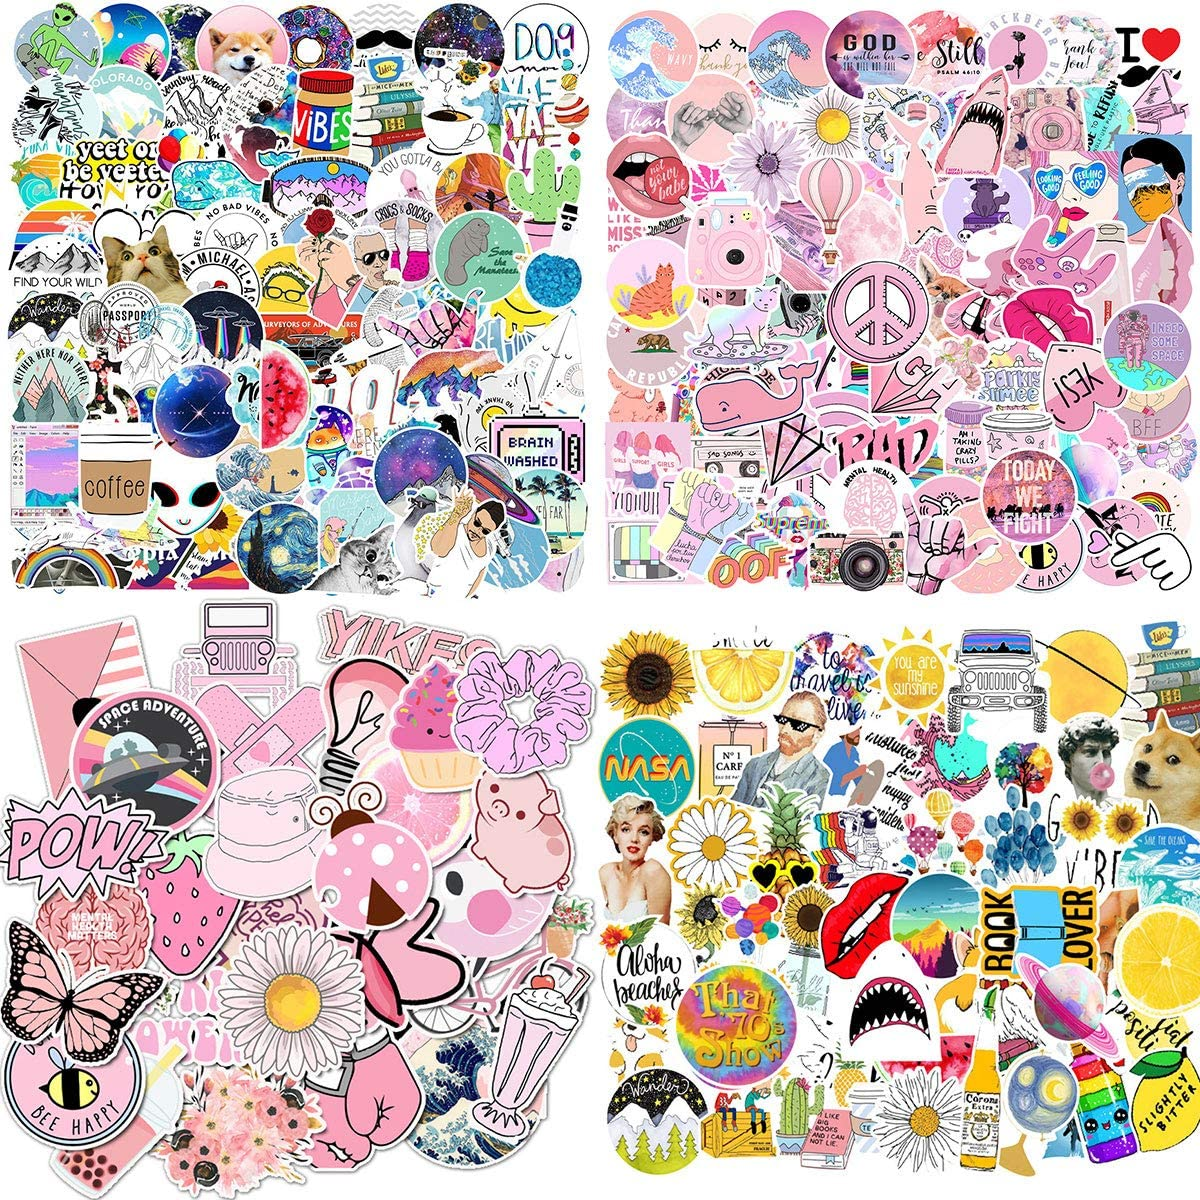 Women Vinyl Stickers Waterproof Girls 309 Pcs Cute Stickers,Laptop and Water Bottle Decal Sticker Pack for Teens